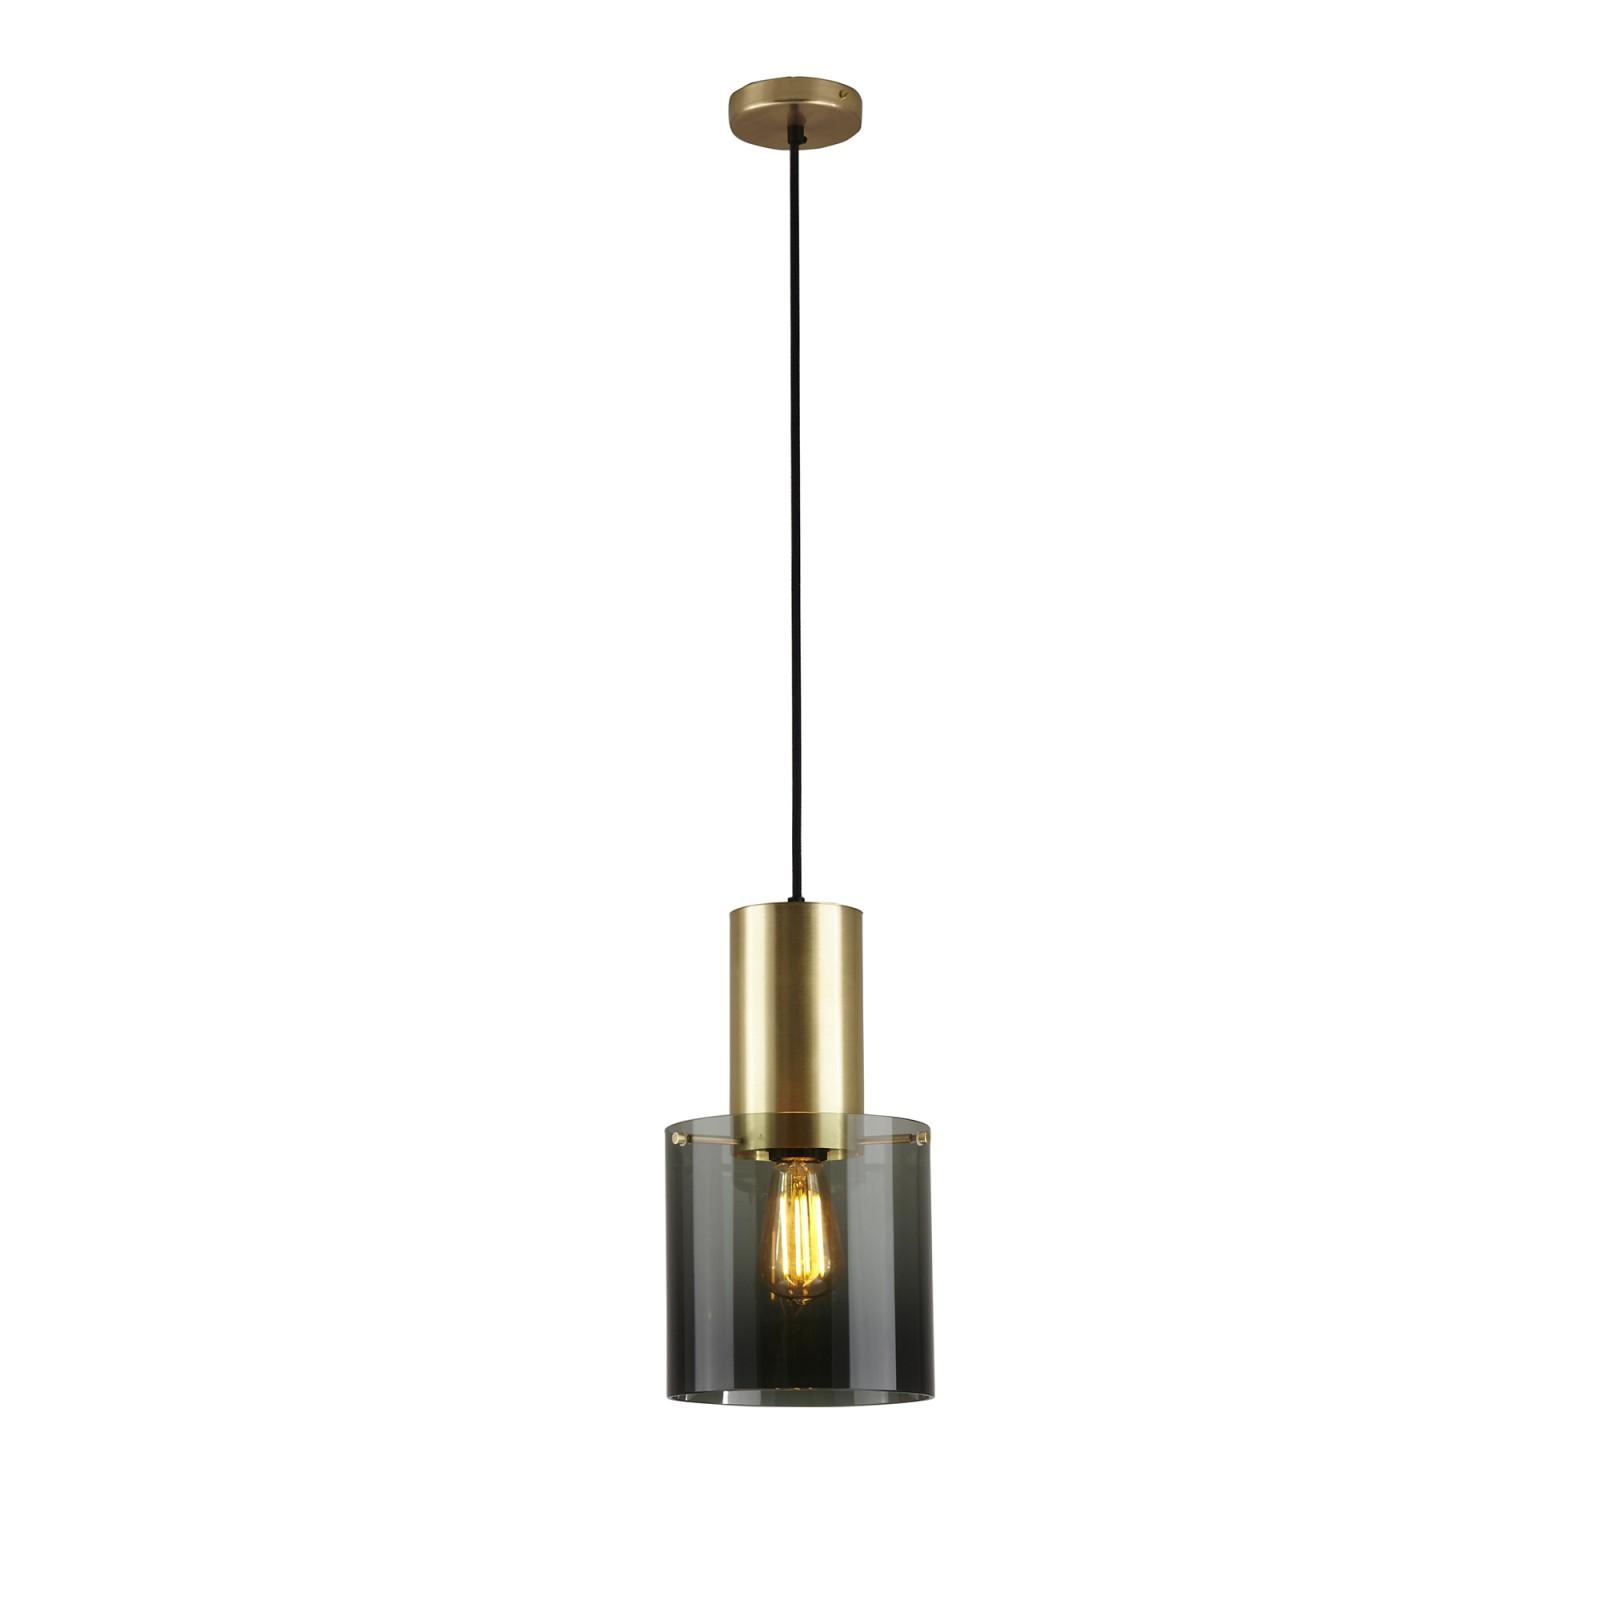 Walter Pendant Light Anthracite Glass & Brass, Large